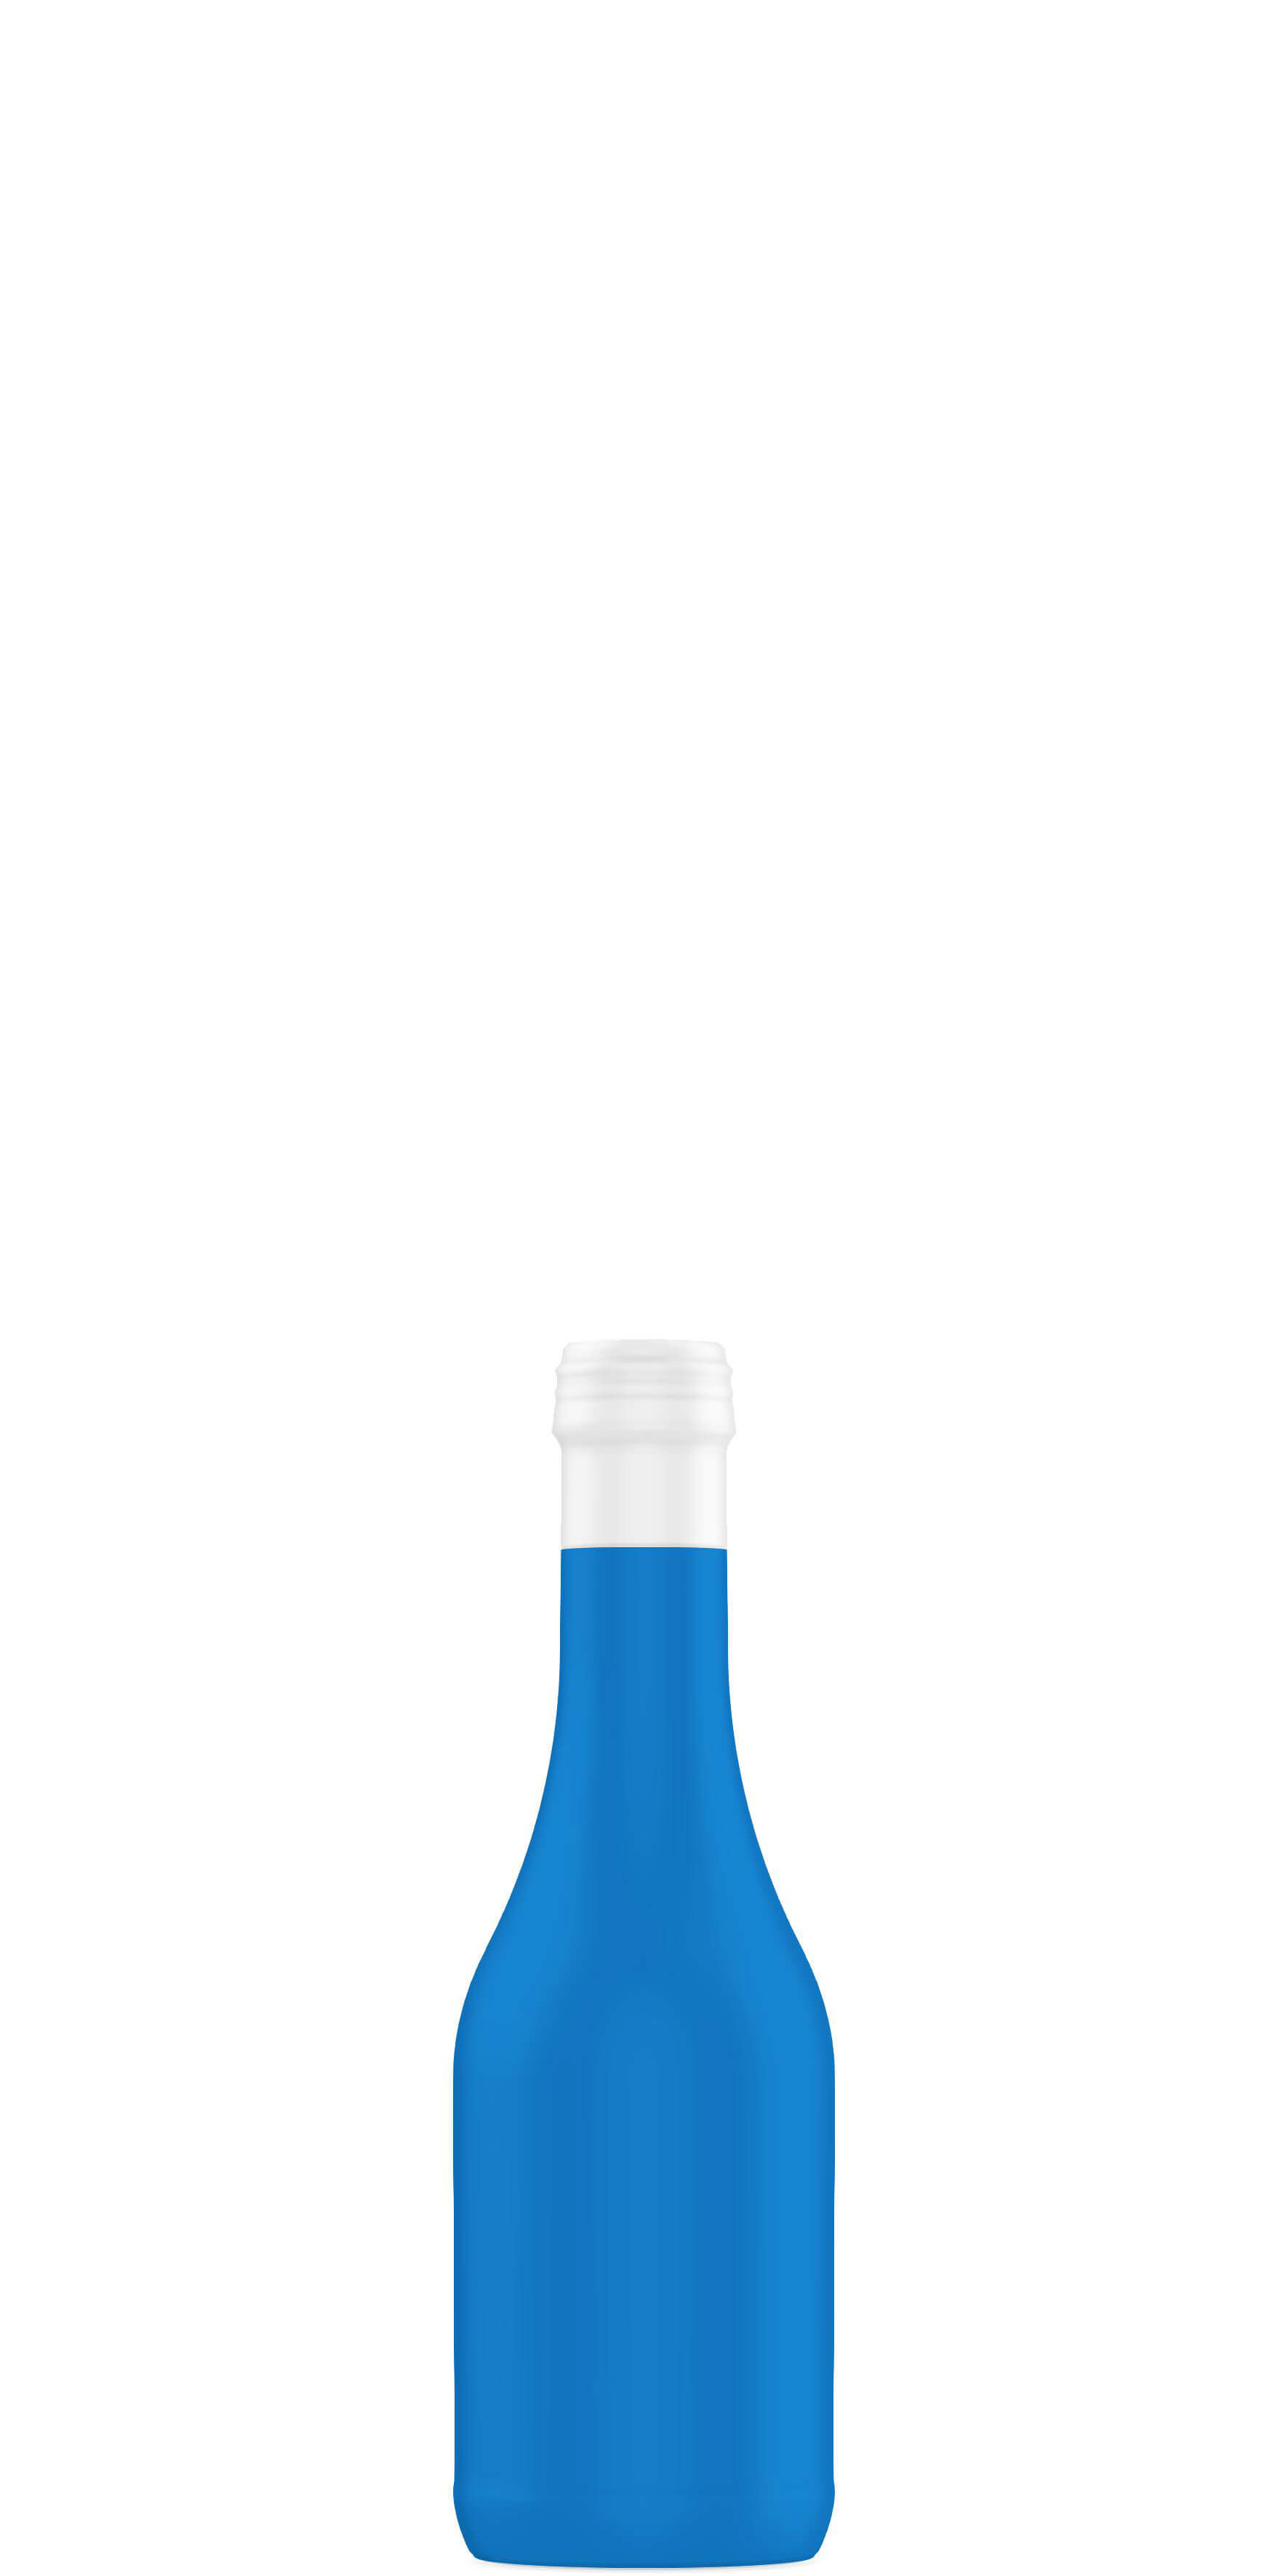 Packaging shape of still wines 25cl